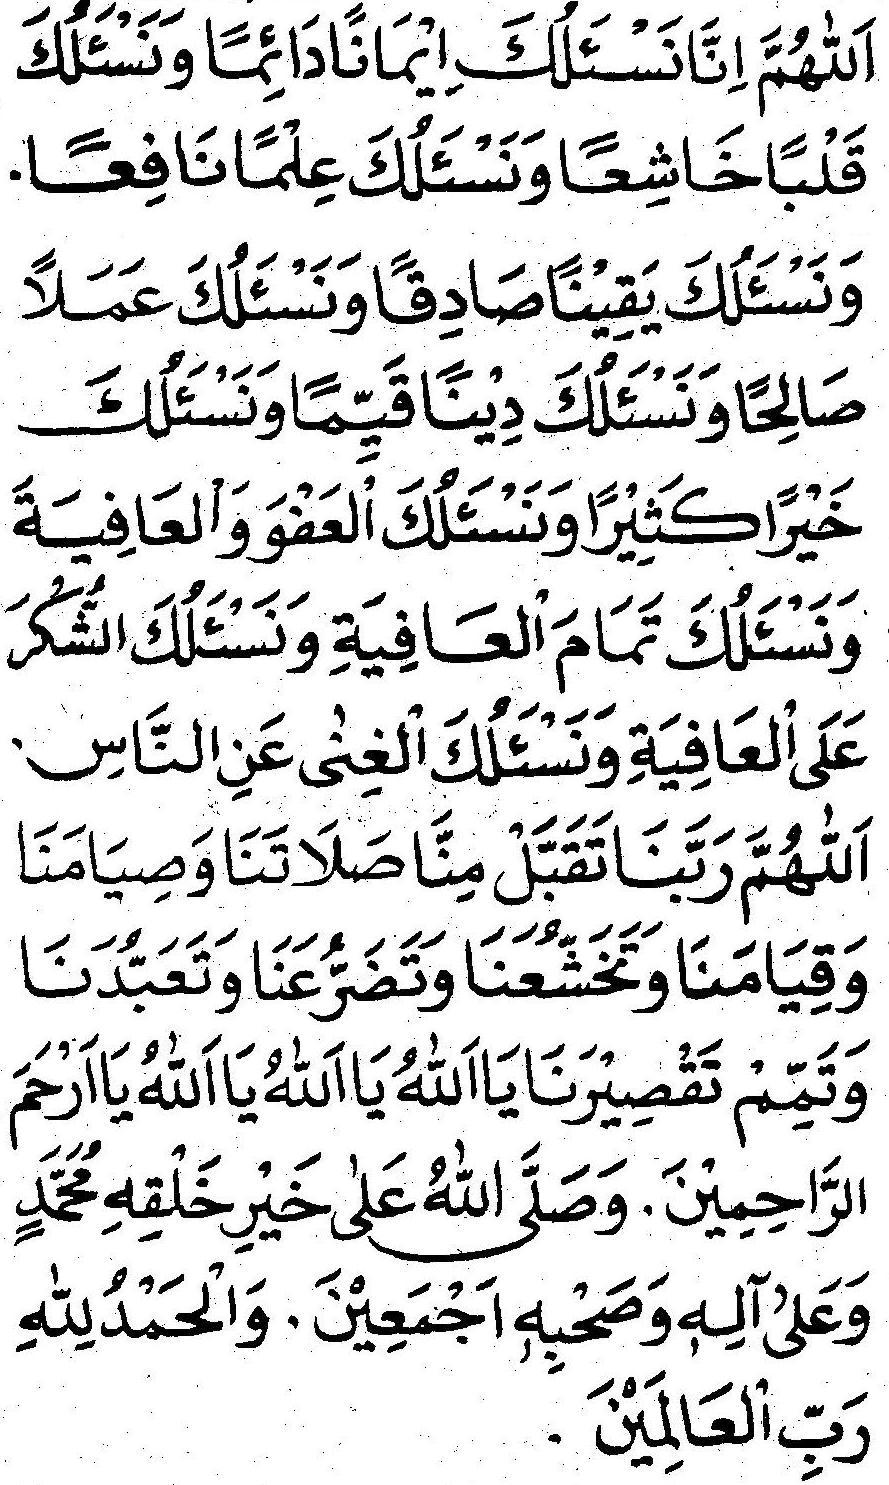 Doa Setelah Sholat Tarawih Dan Witir Pdf